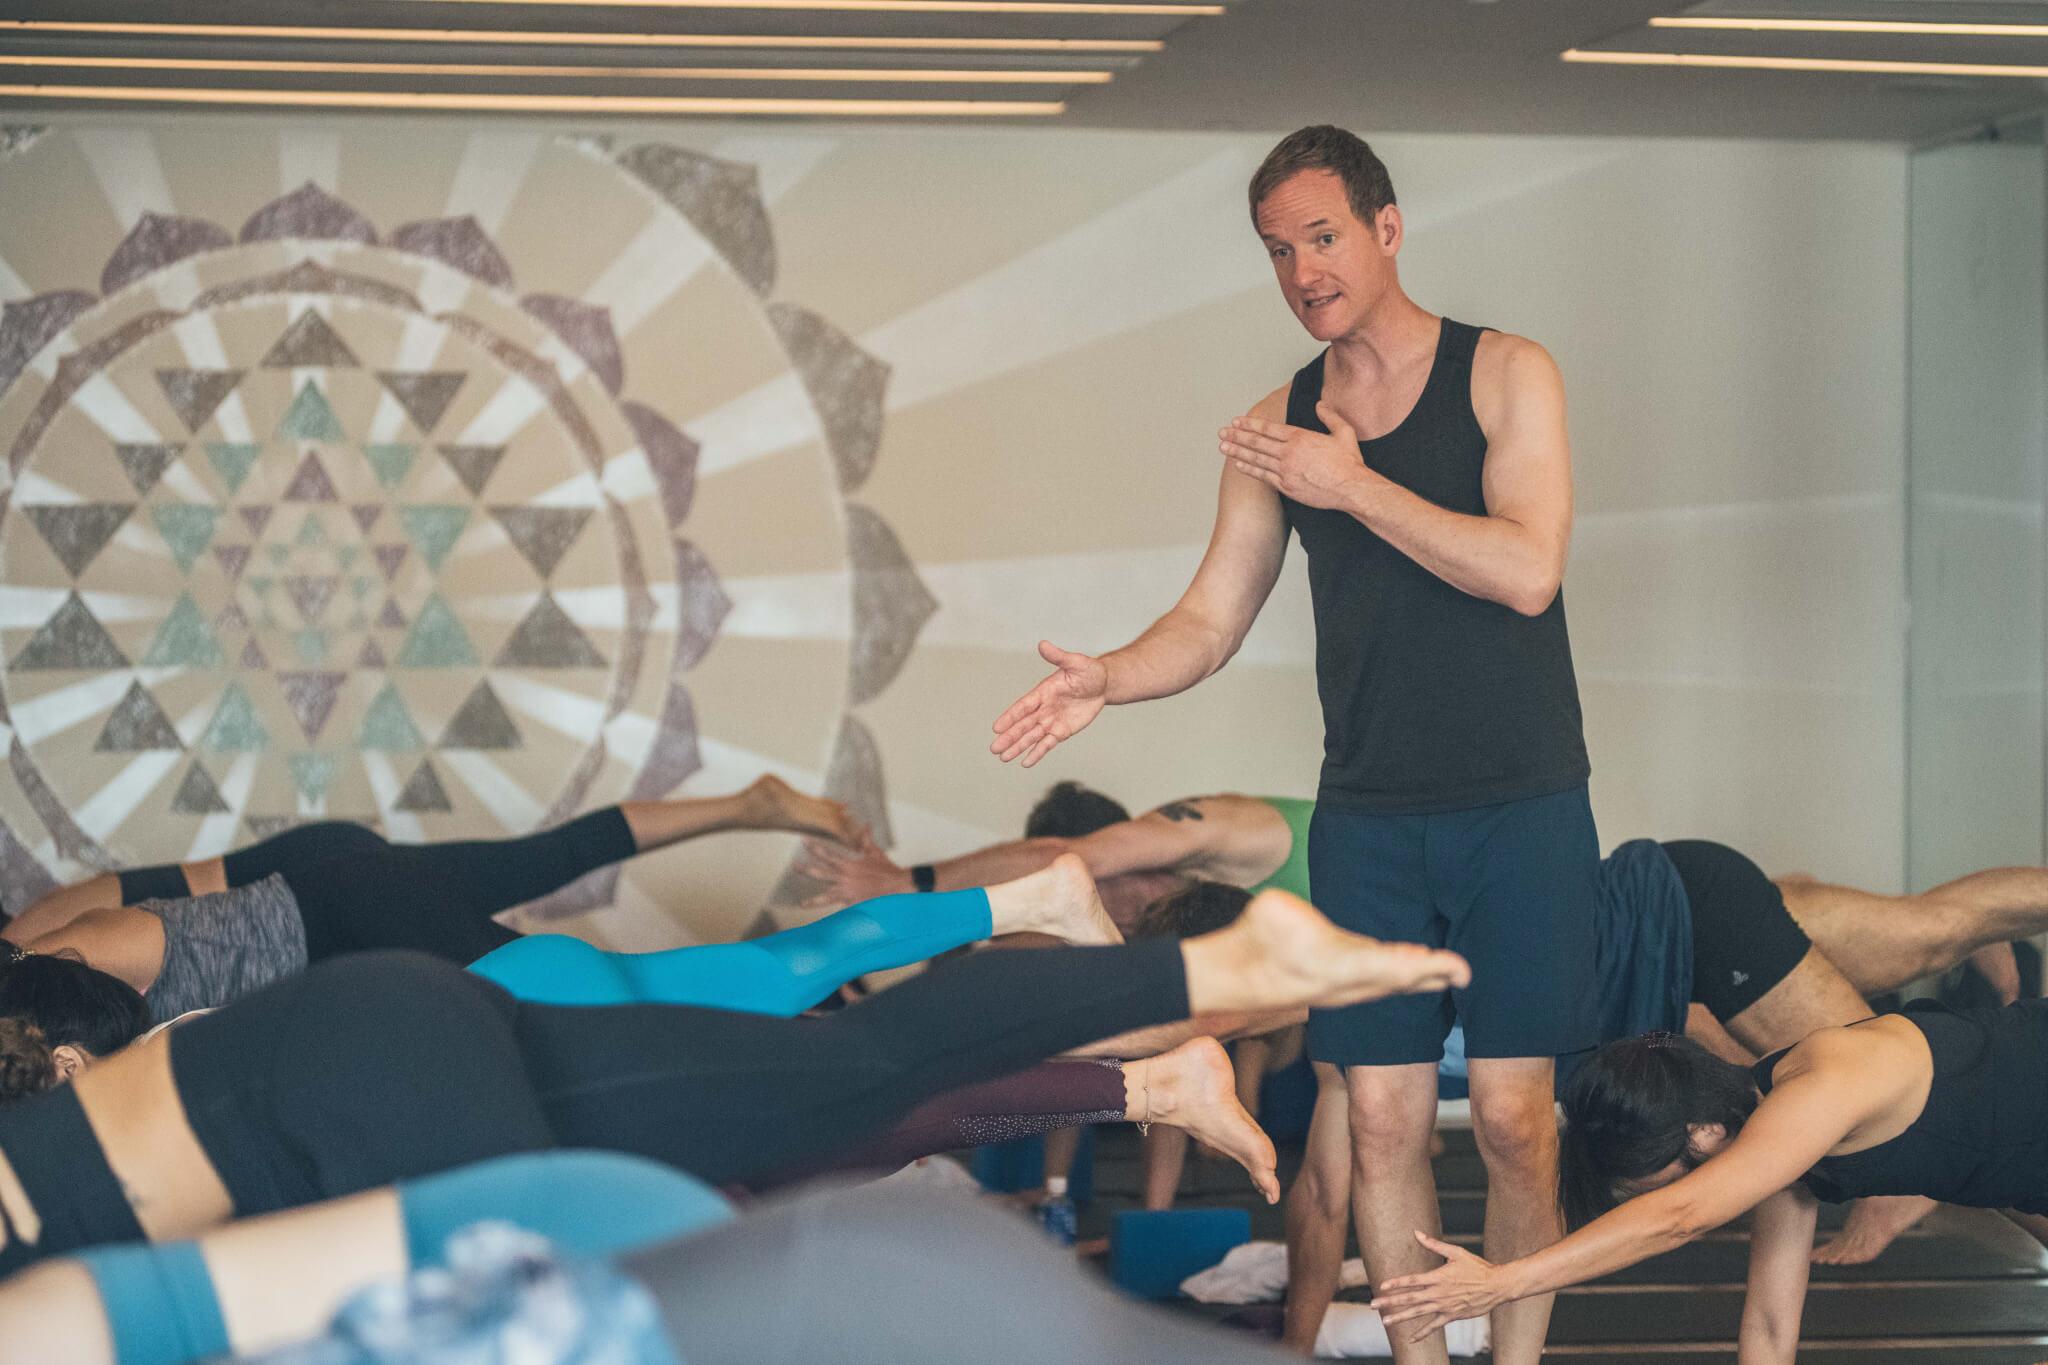 Jason Crandell teaching